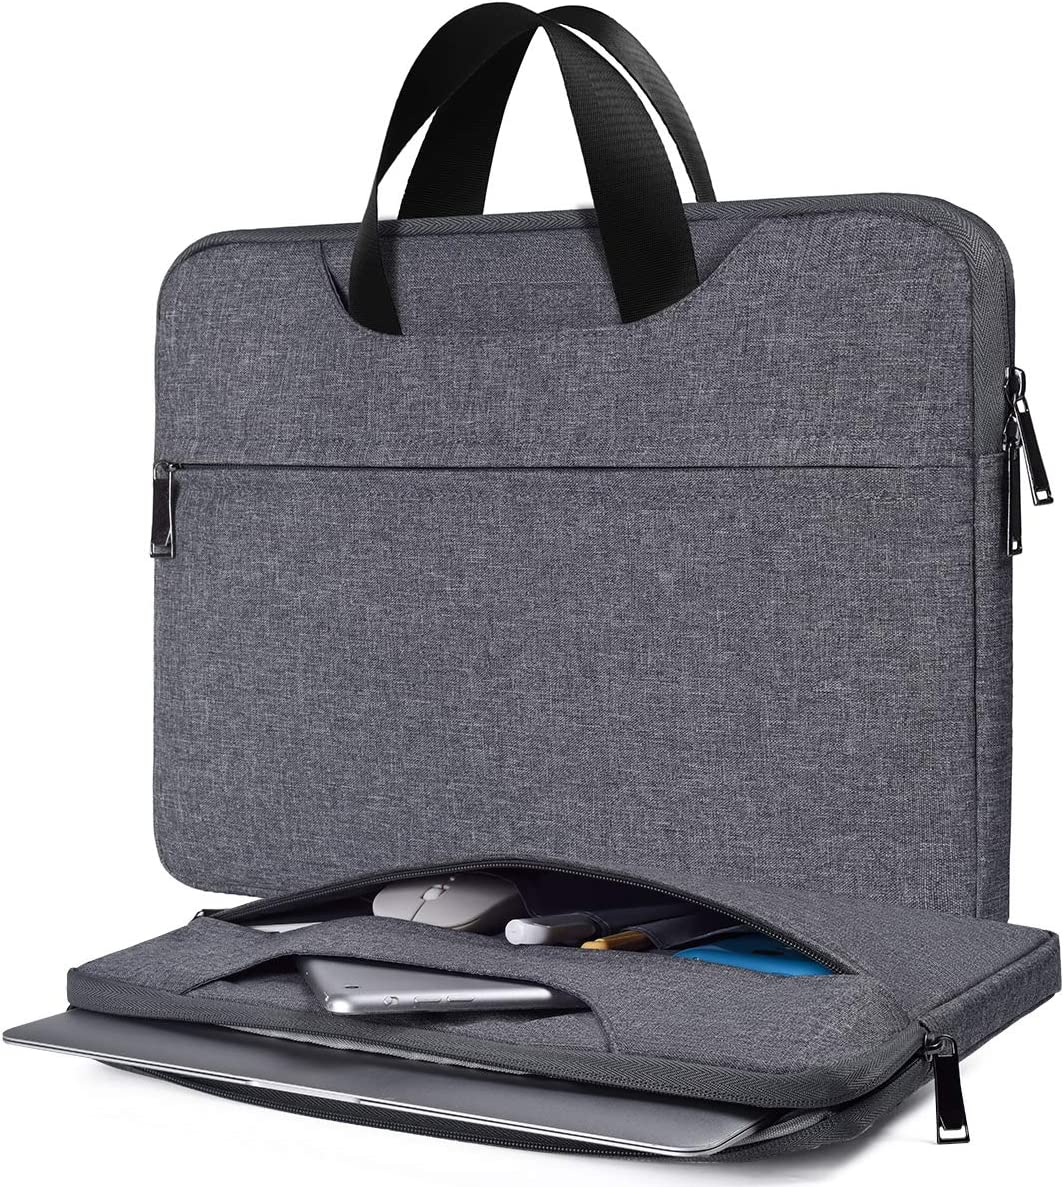 15.6 Inch Laptop Bag, Men Women Travel Briefcase Laptop Sleeve for Dell Inspiron 15 5000, Acer Aspire 5 A515/Aspire E15, HP Spectre x360 15.6, ASUS Chromebook 15.6, Lenovo Ideapad 330 15.6 Case, Gray